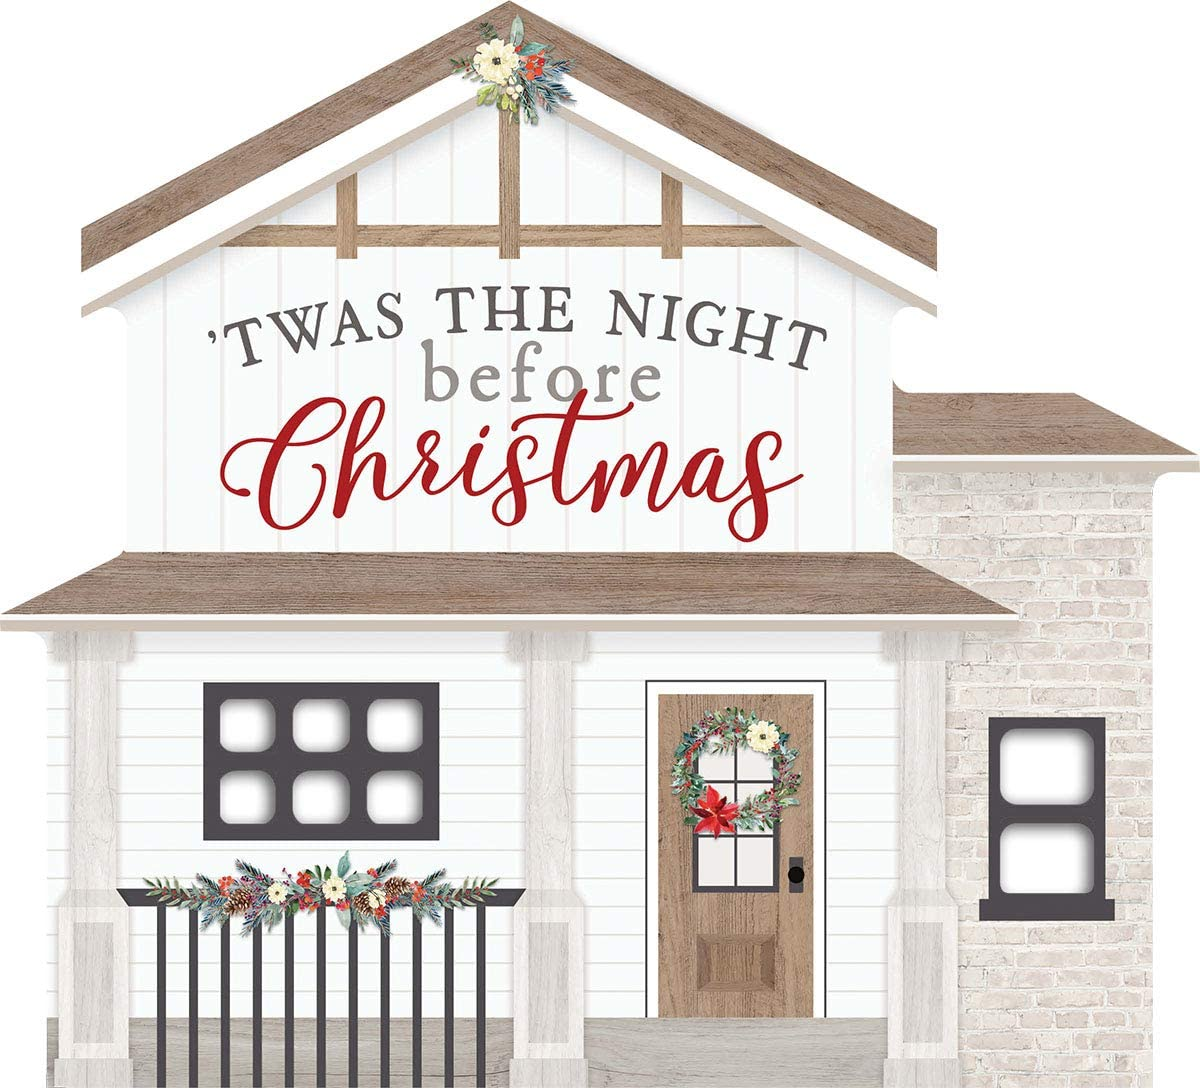 P Graham Dunn TWAS The Night Before Christmas Winter White 8 x 7.25 Wood Christmas Shape Sign